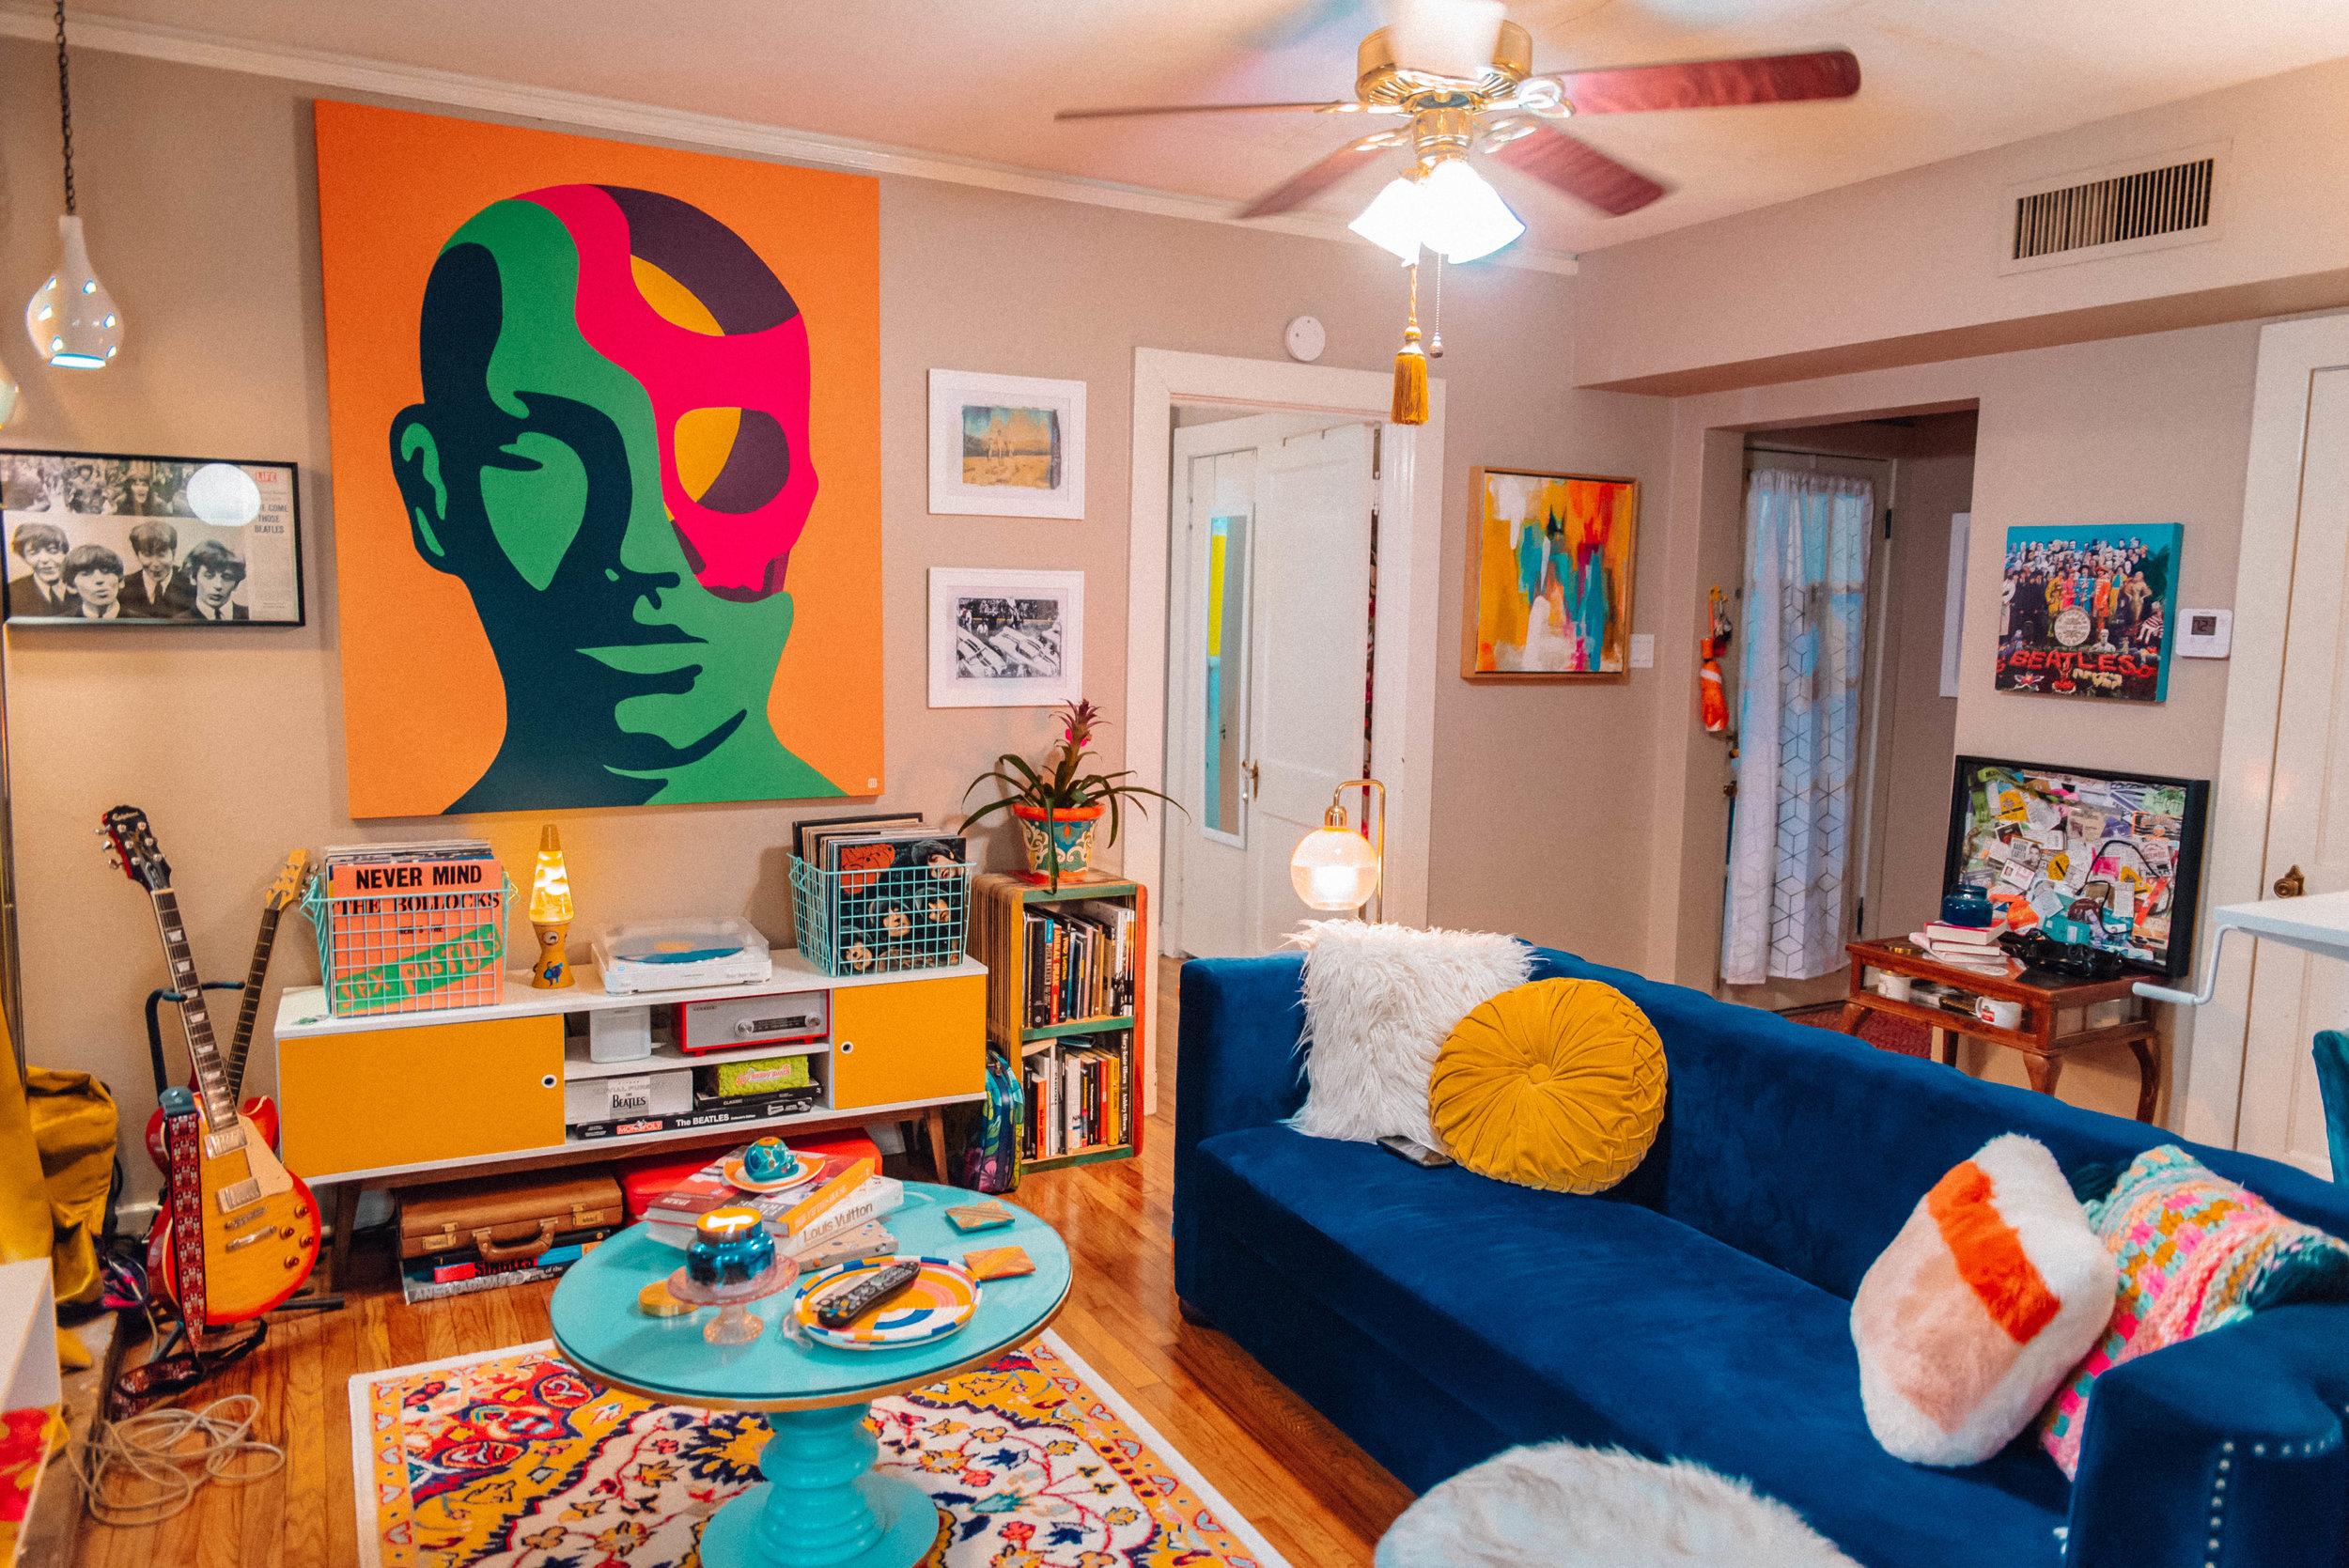 My Chromatic Home | Apartment Tour with Jordan Hefler